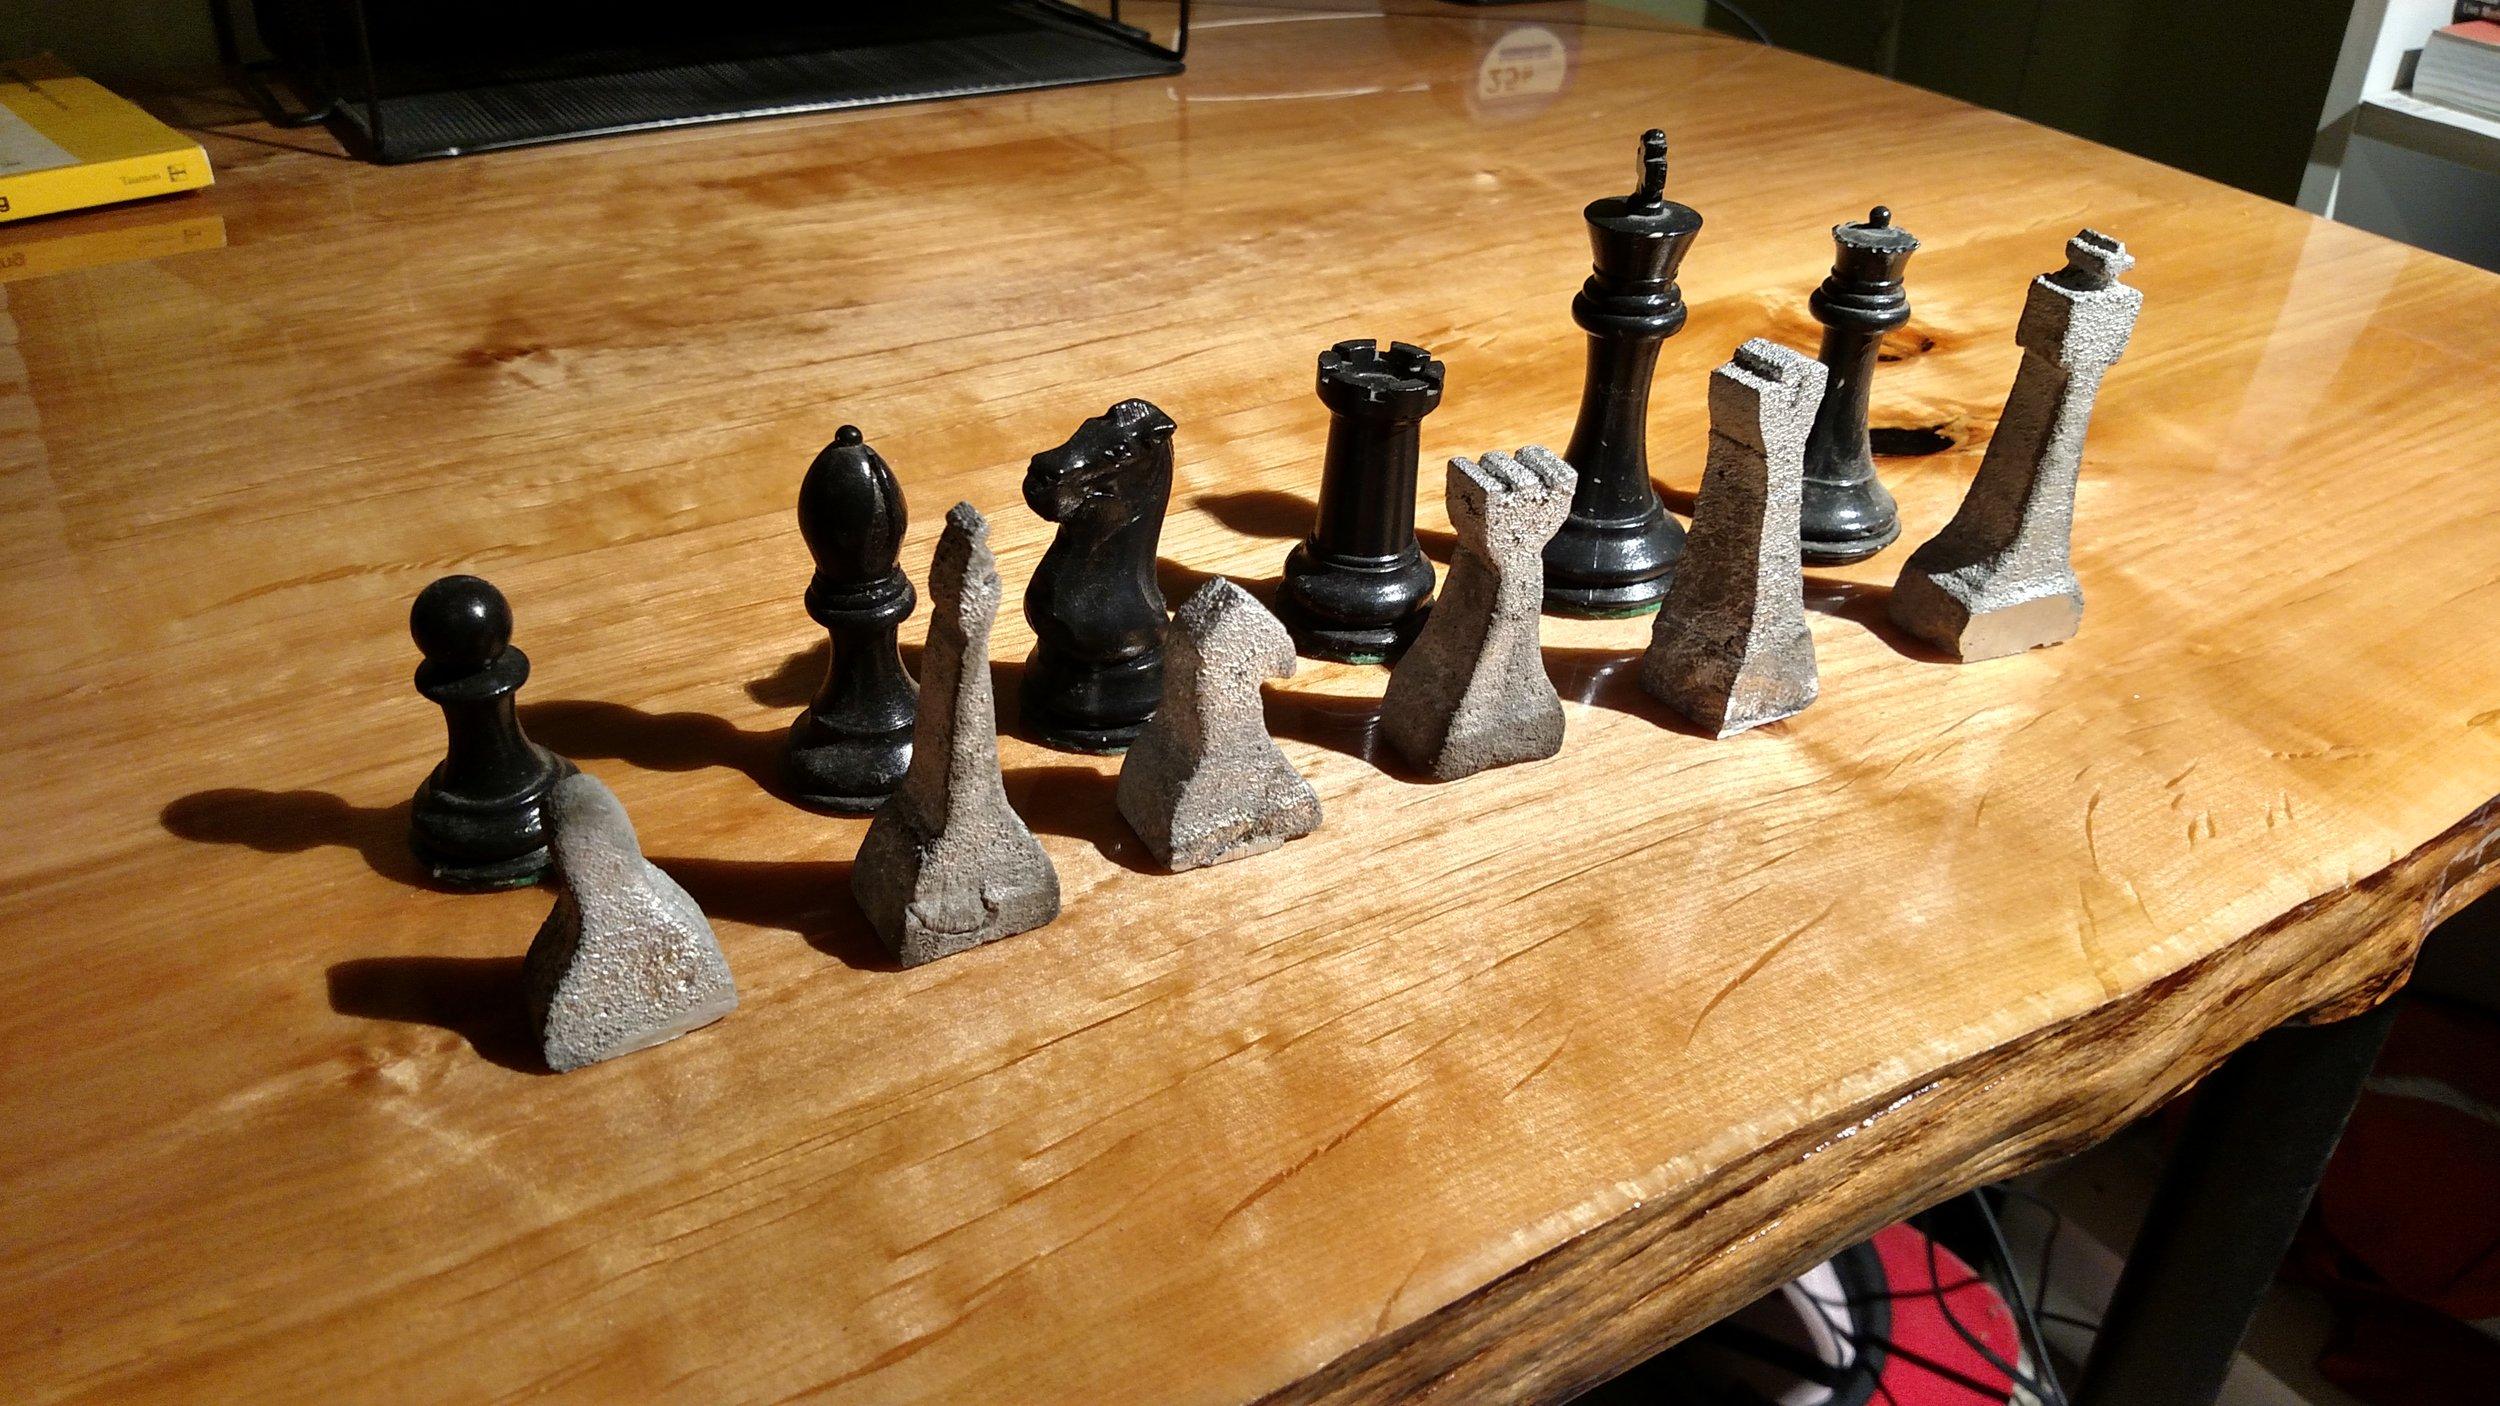 Details of the rough cast Aluminum chess pieces as compared to the cast concrete set.